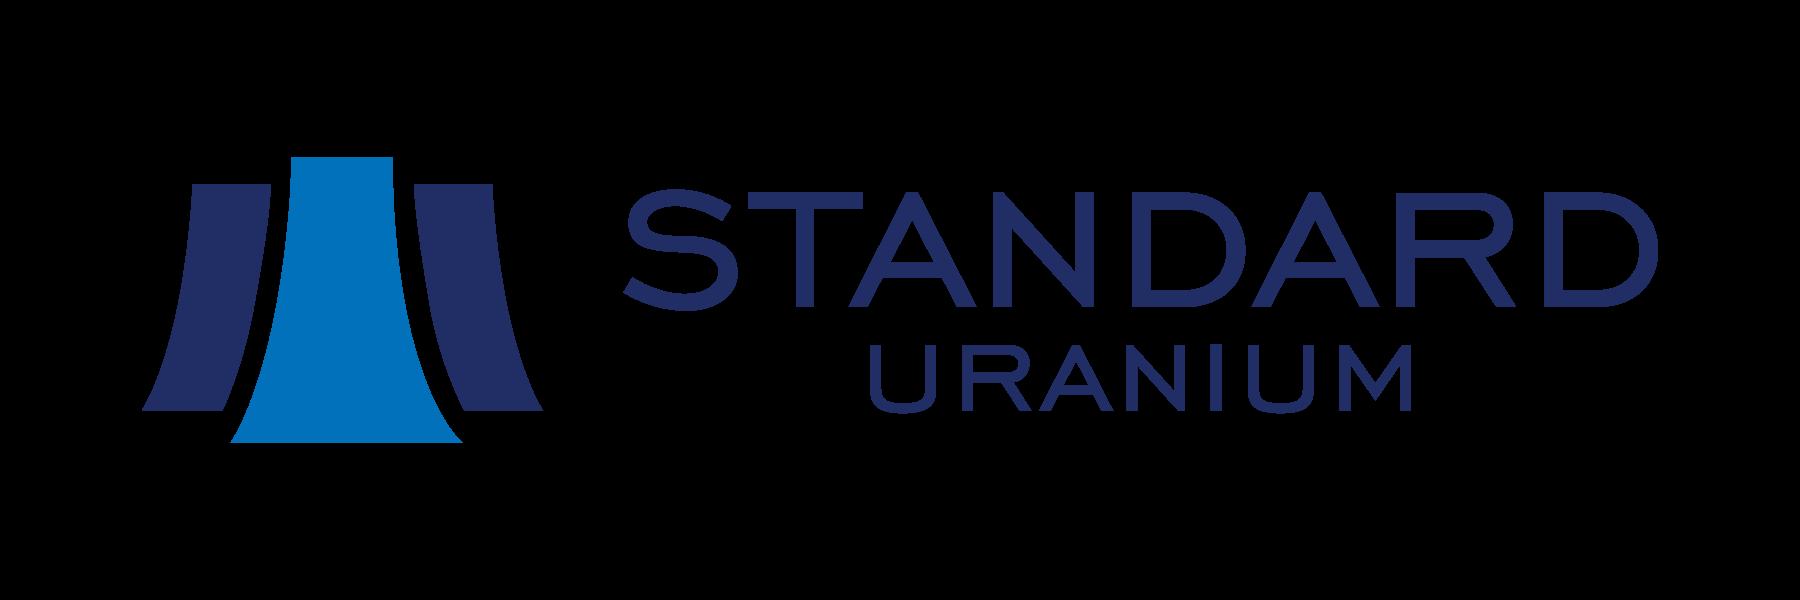 Standard Uranium Concludes Phase I Drilling at its Flagship Davidson River Project, Announces Gunnar Exploration Program